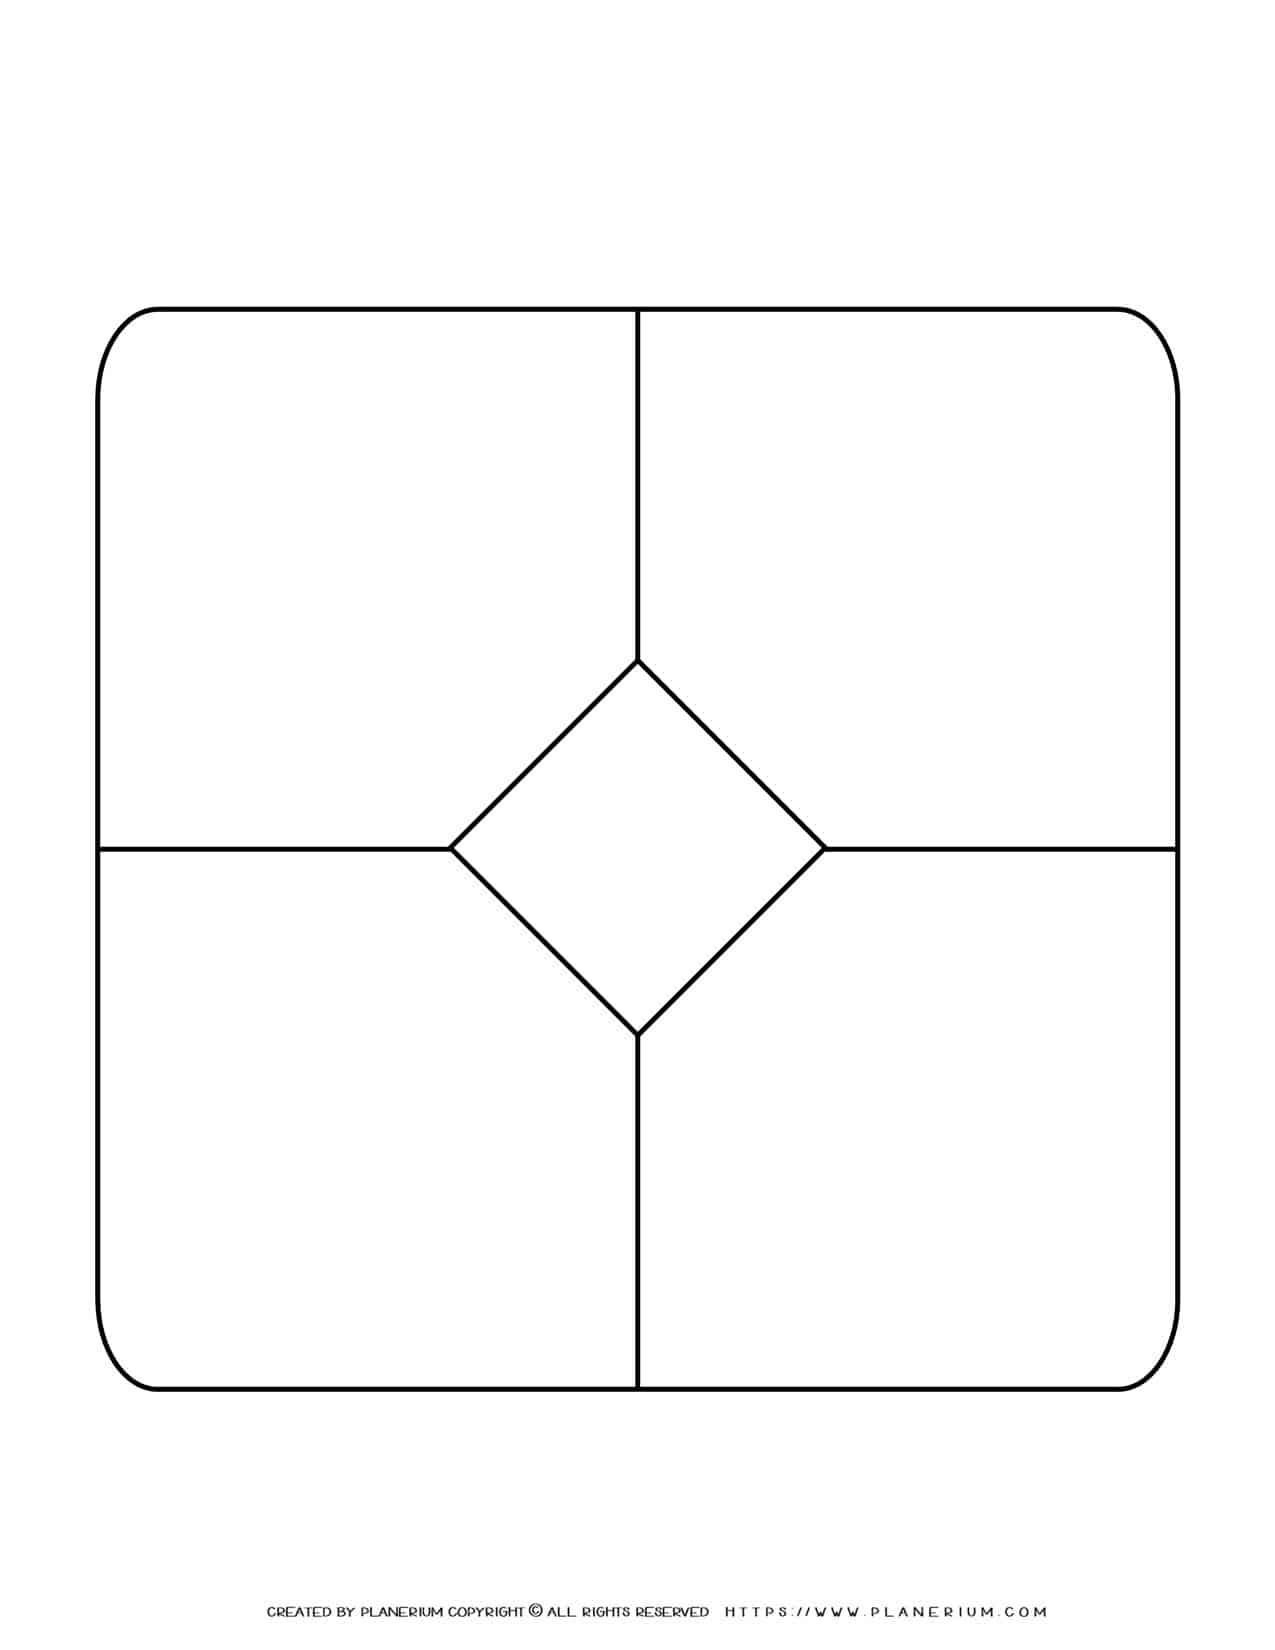 Story Map Template - Center Rhombus   Planerium